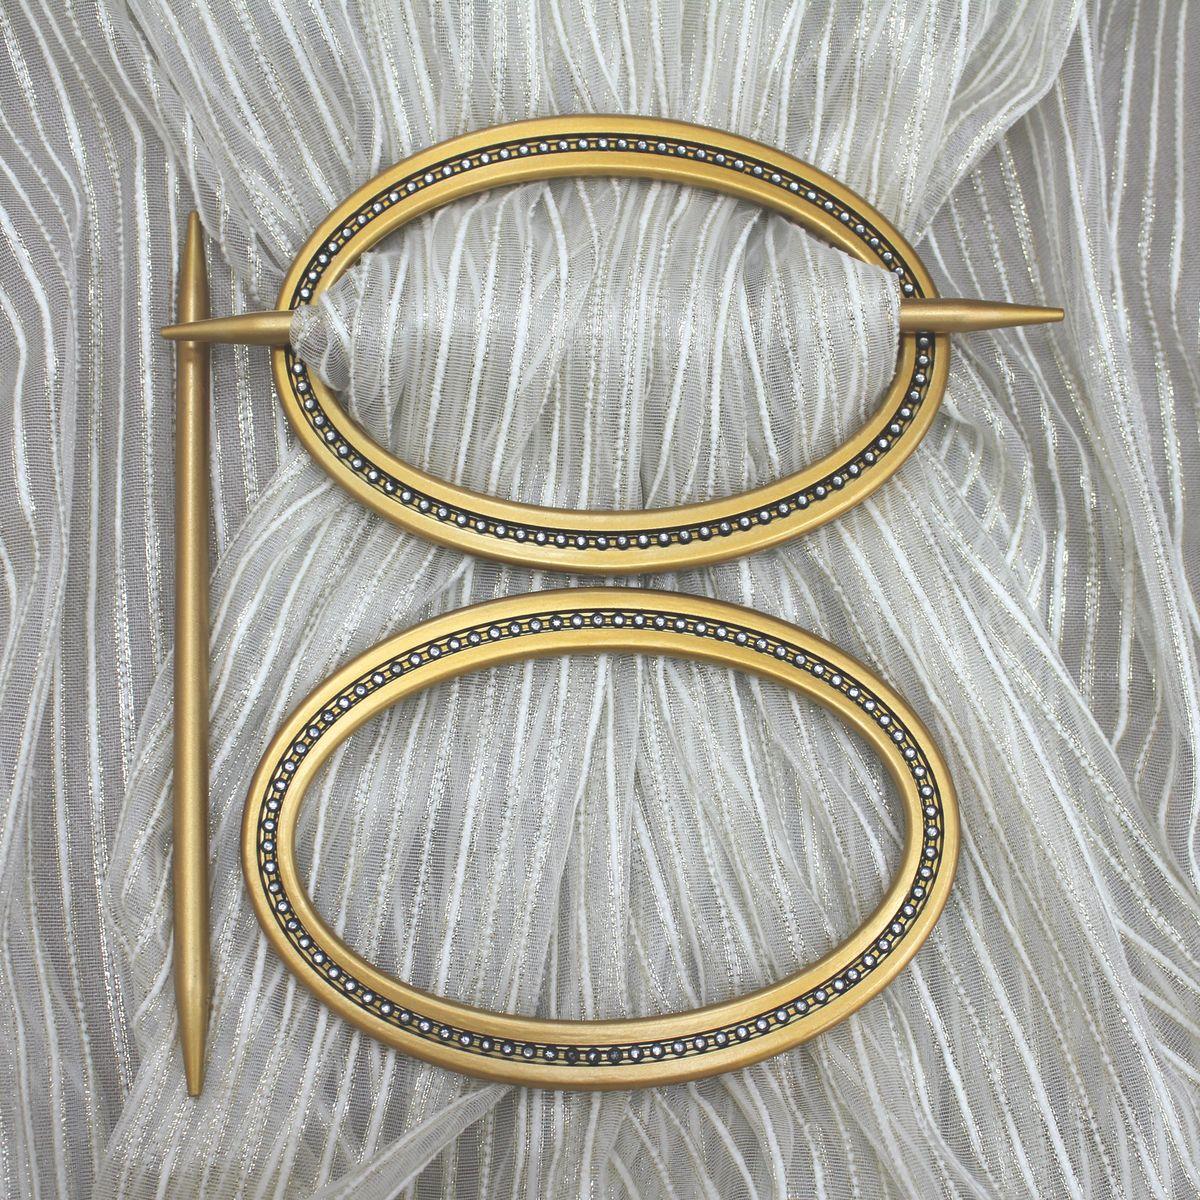 Заколка для штор TexRepublic Oval, цвет: золотистый, 2 шт. MI C6-2 гребни bizon гребень диадема заколка